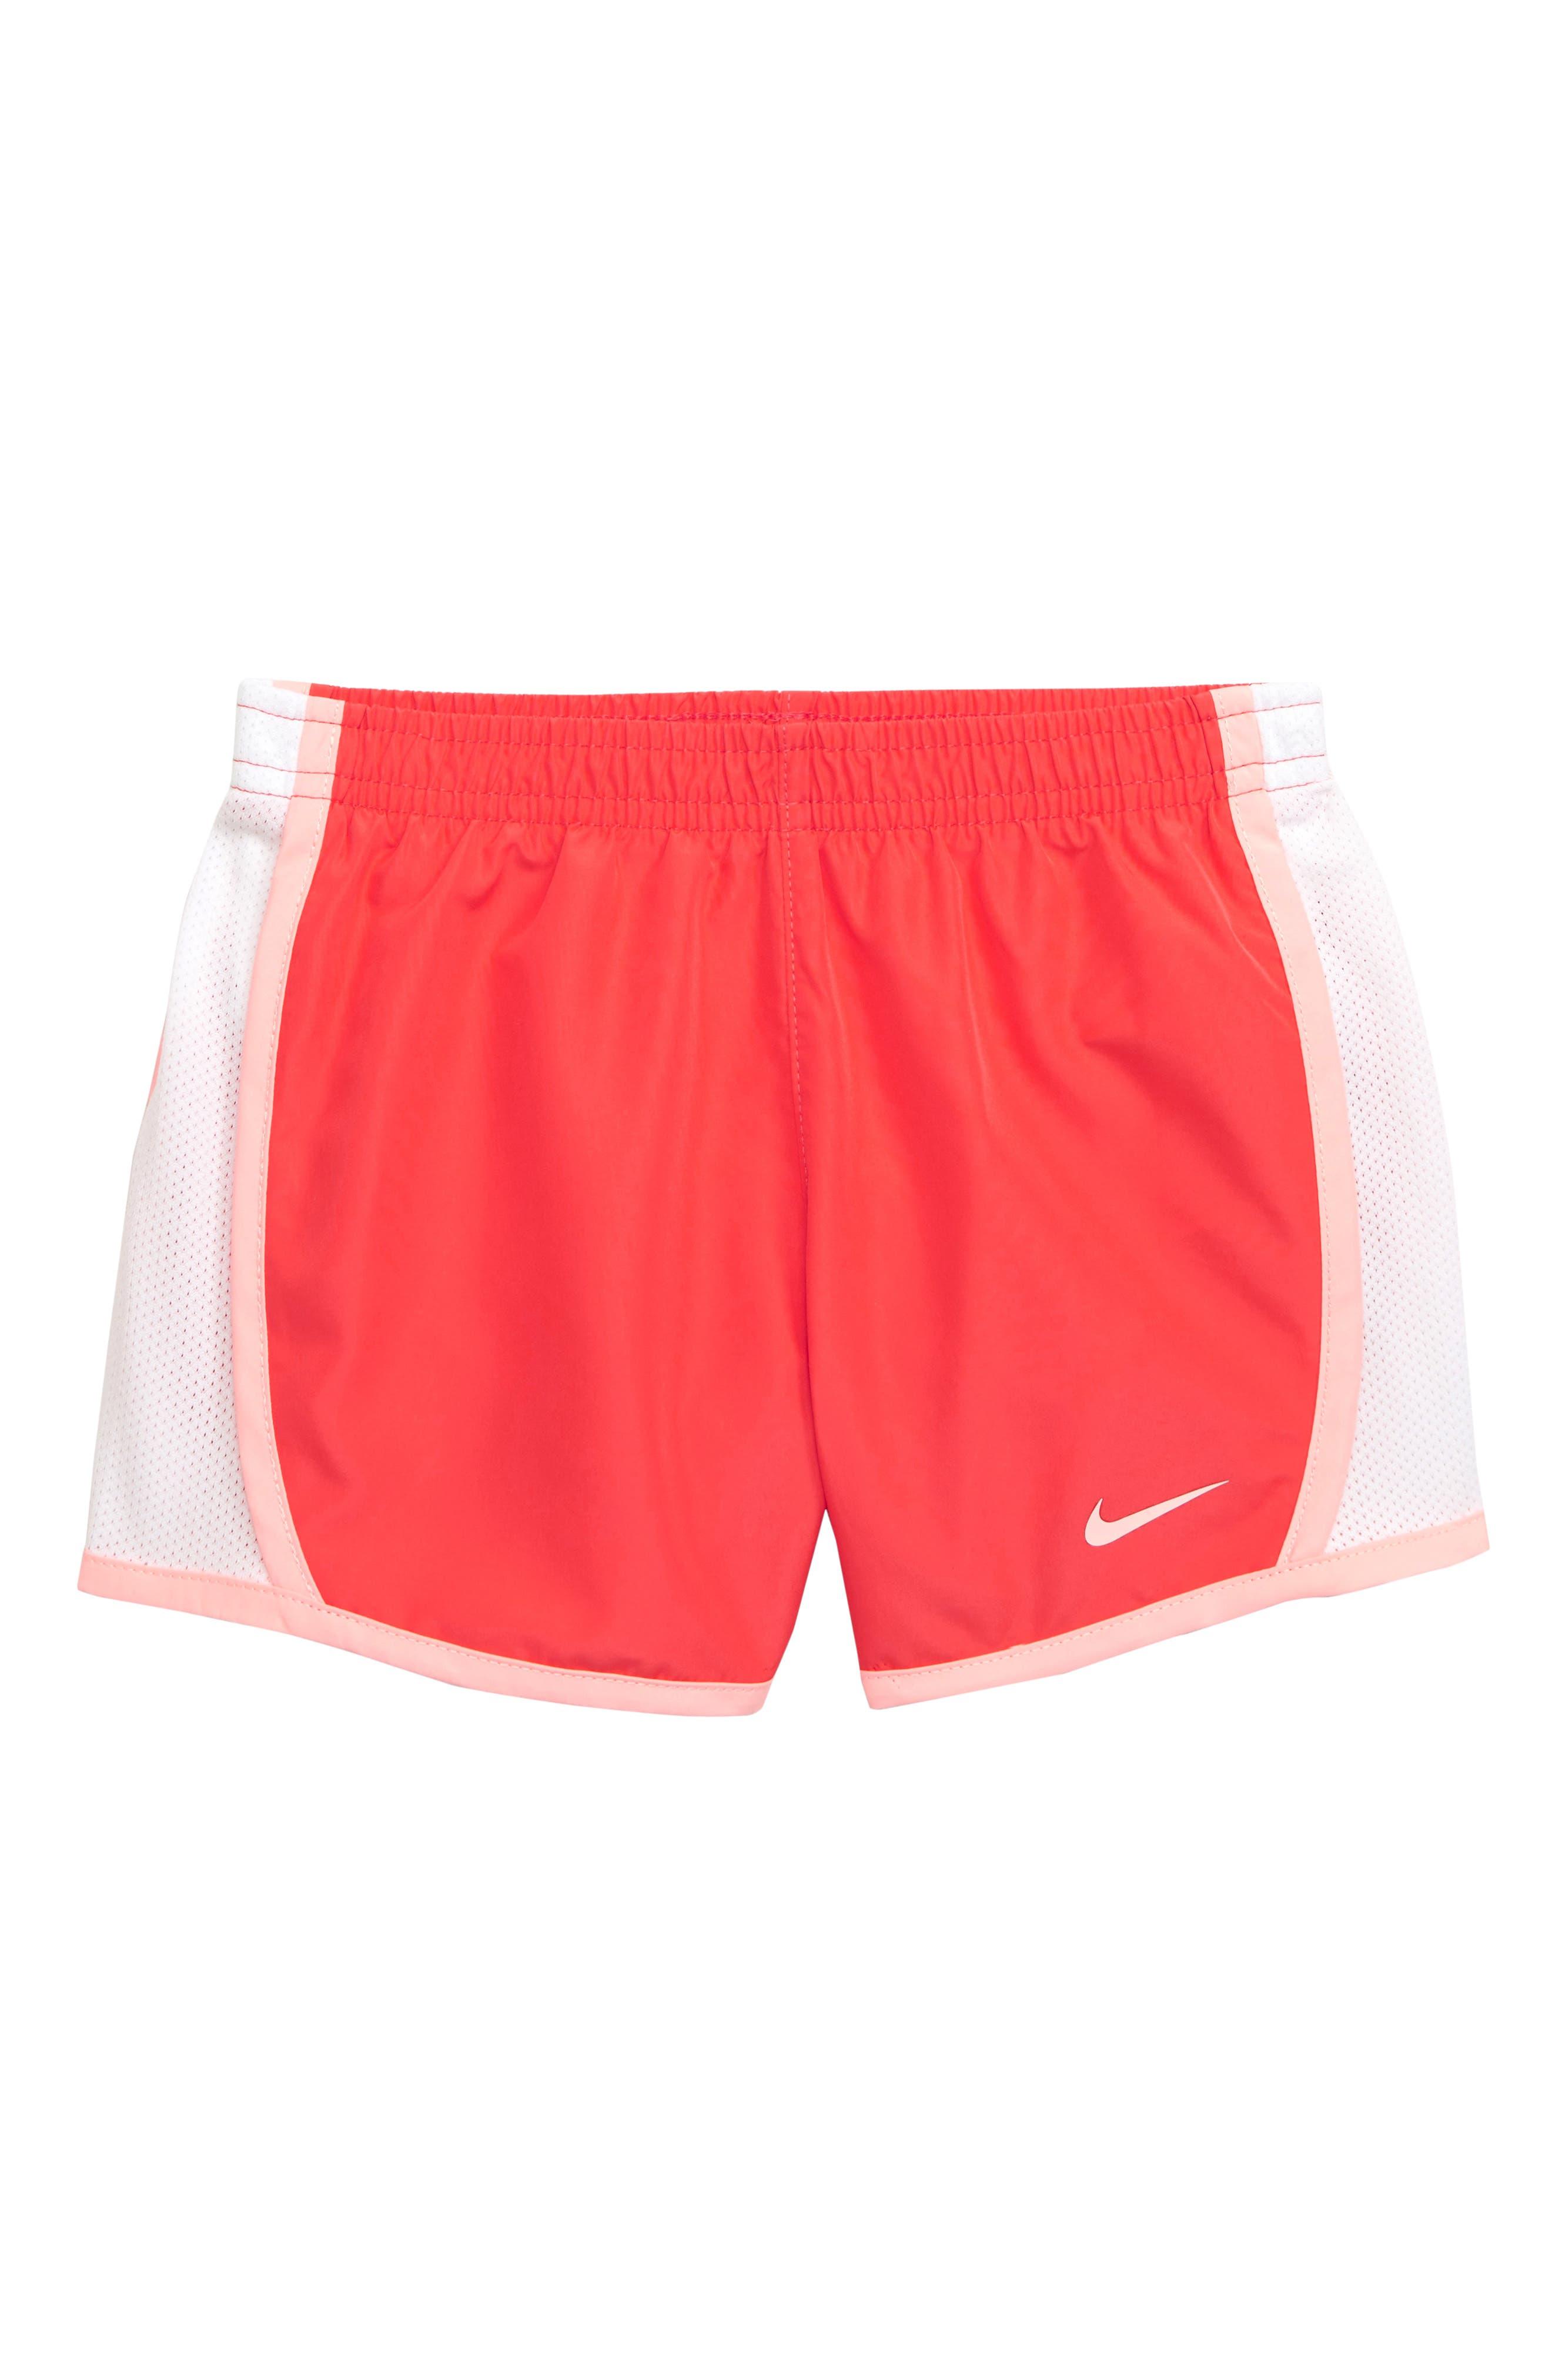 NIKE, Tempo Dri-FIT Shorts, Main thumbnail 1, color, EMBER GLOW